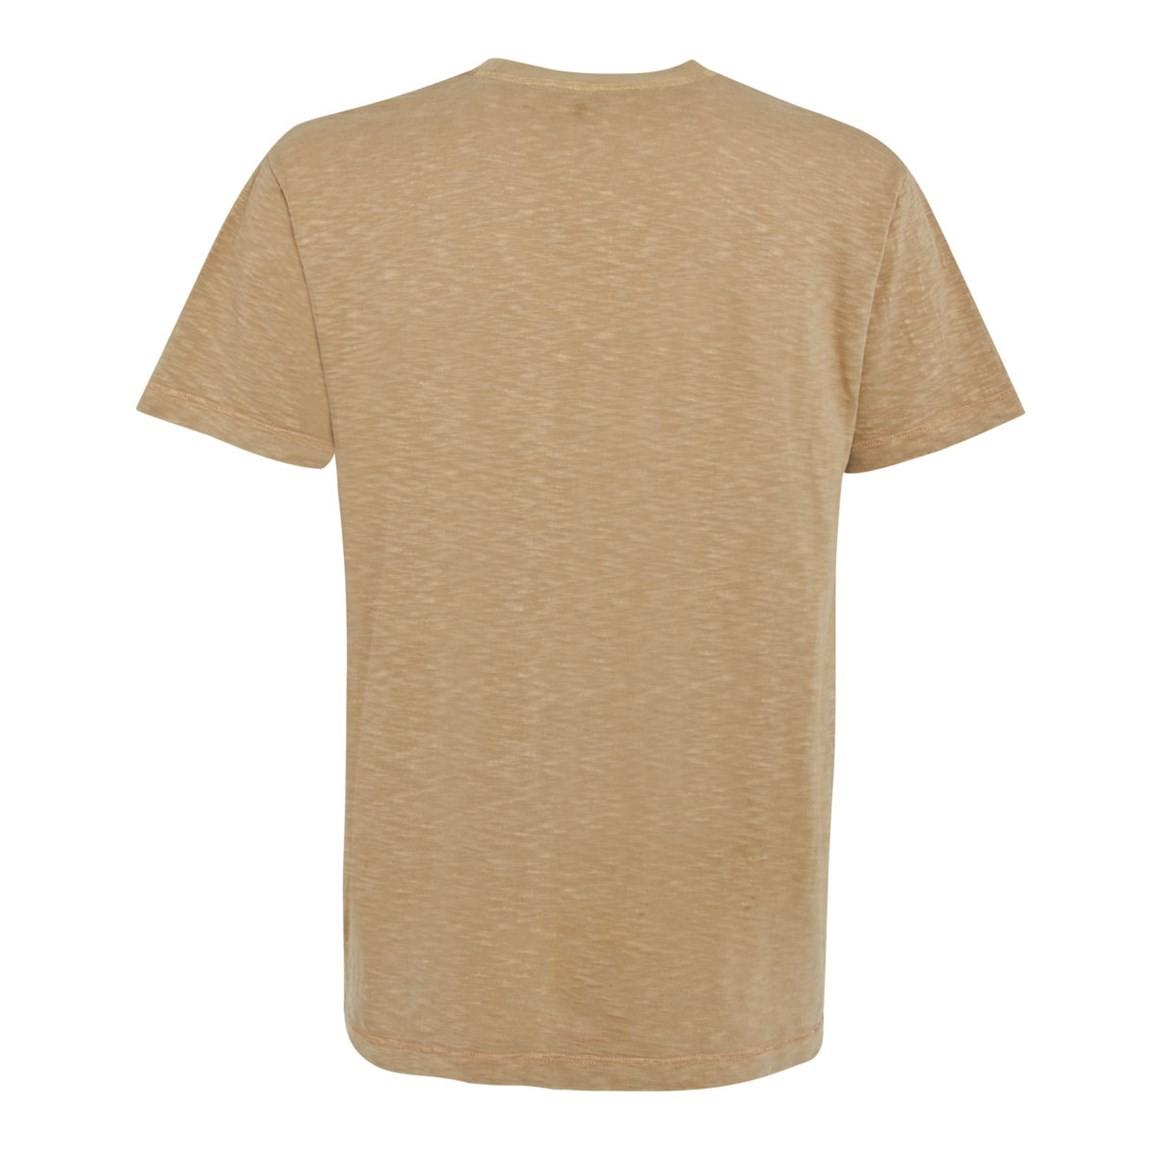 Shipping Printed Graphic T Shirt Pebblestone